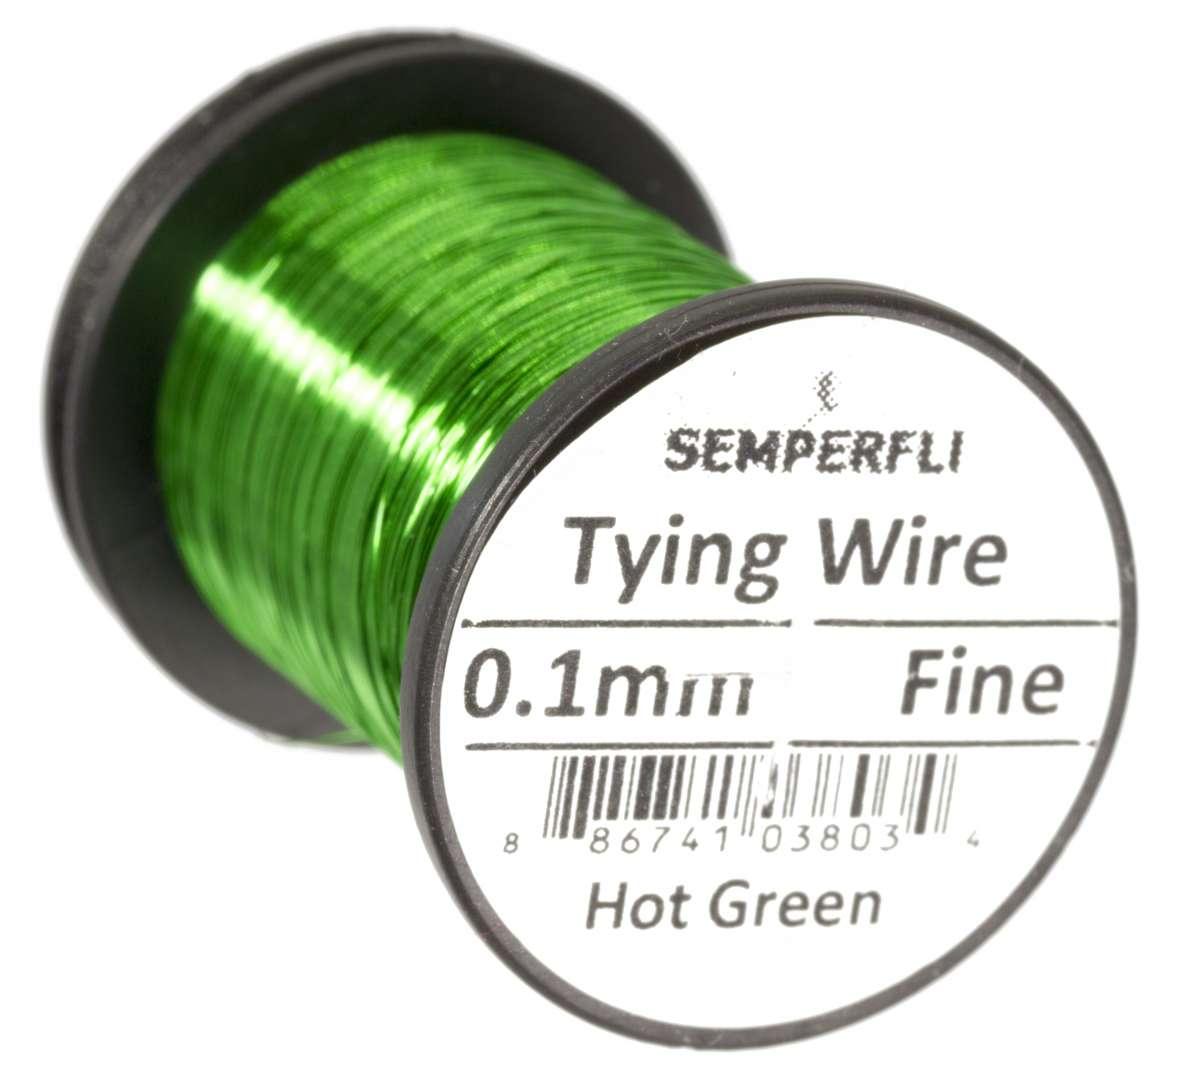 finewire hot green